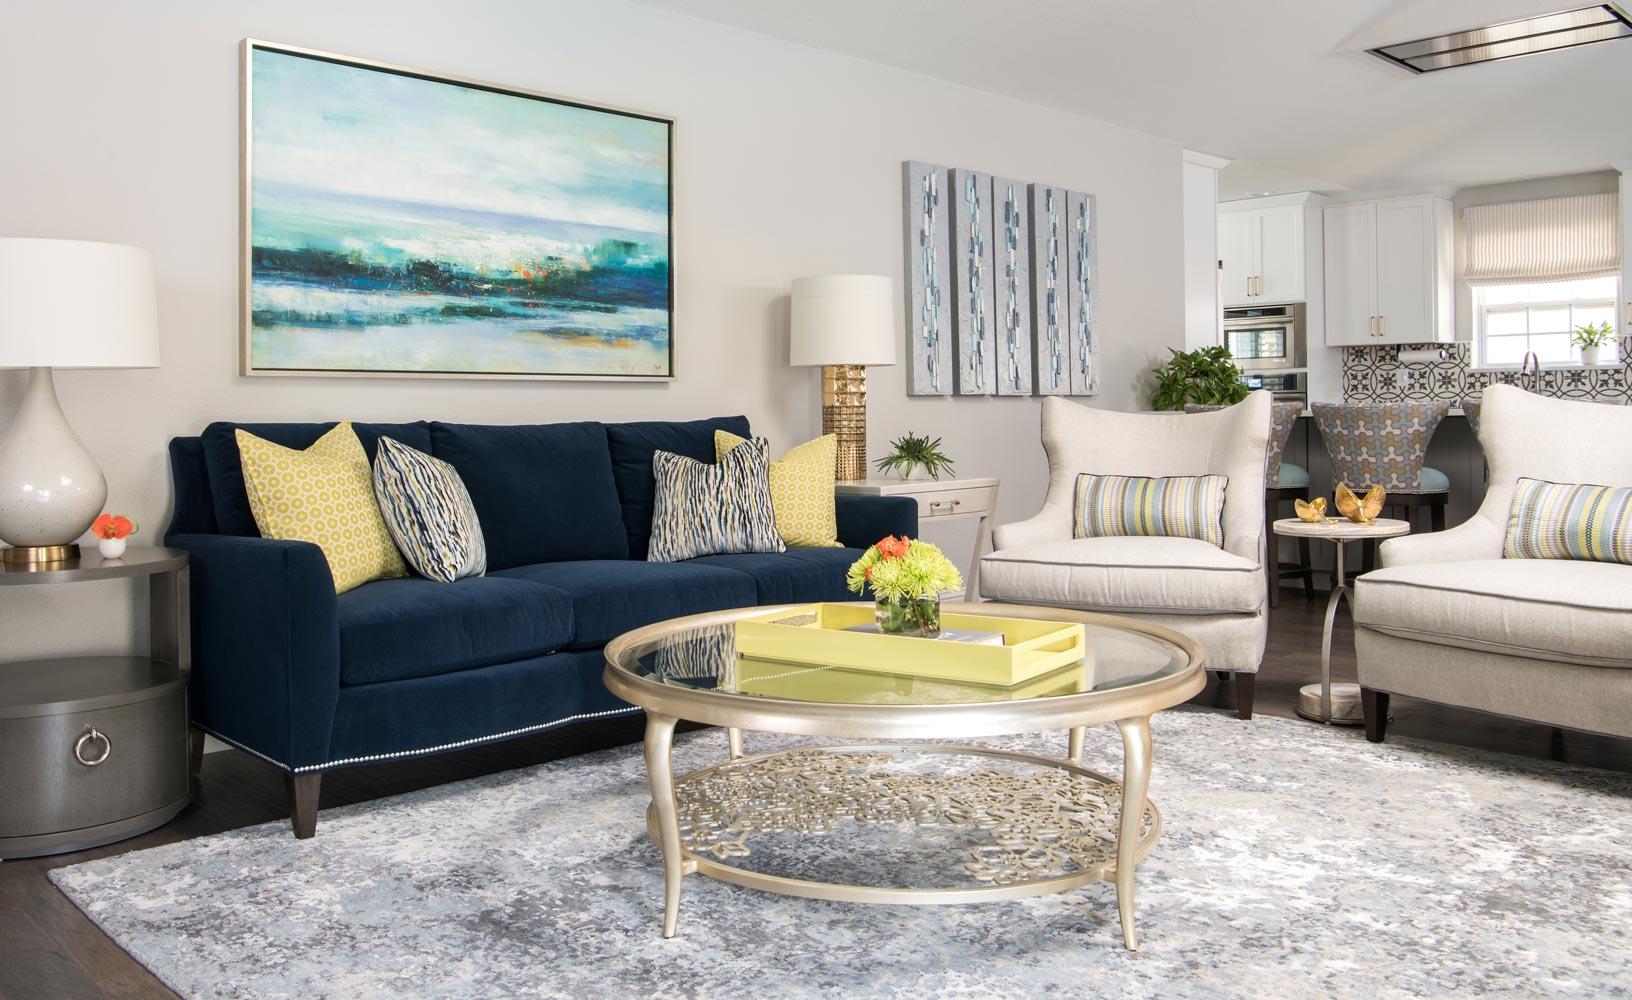 Fullsize Of Interior Living Room Designs